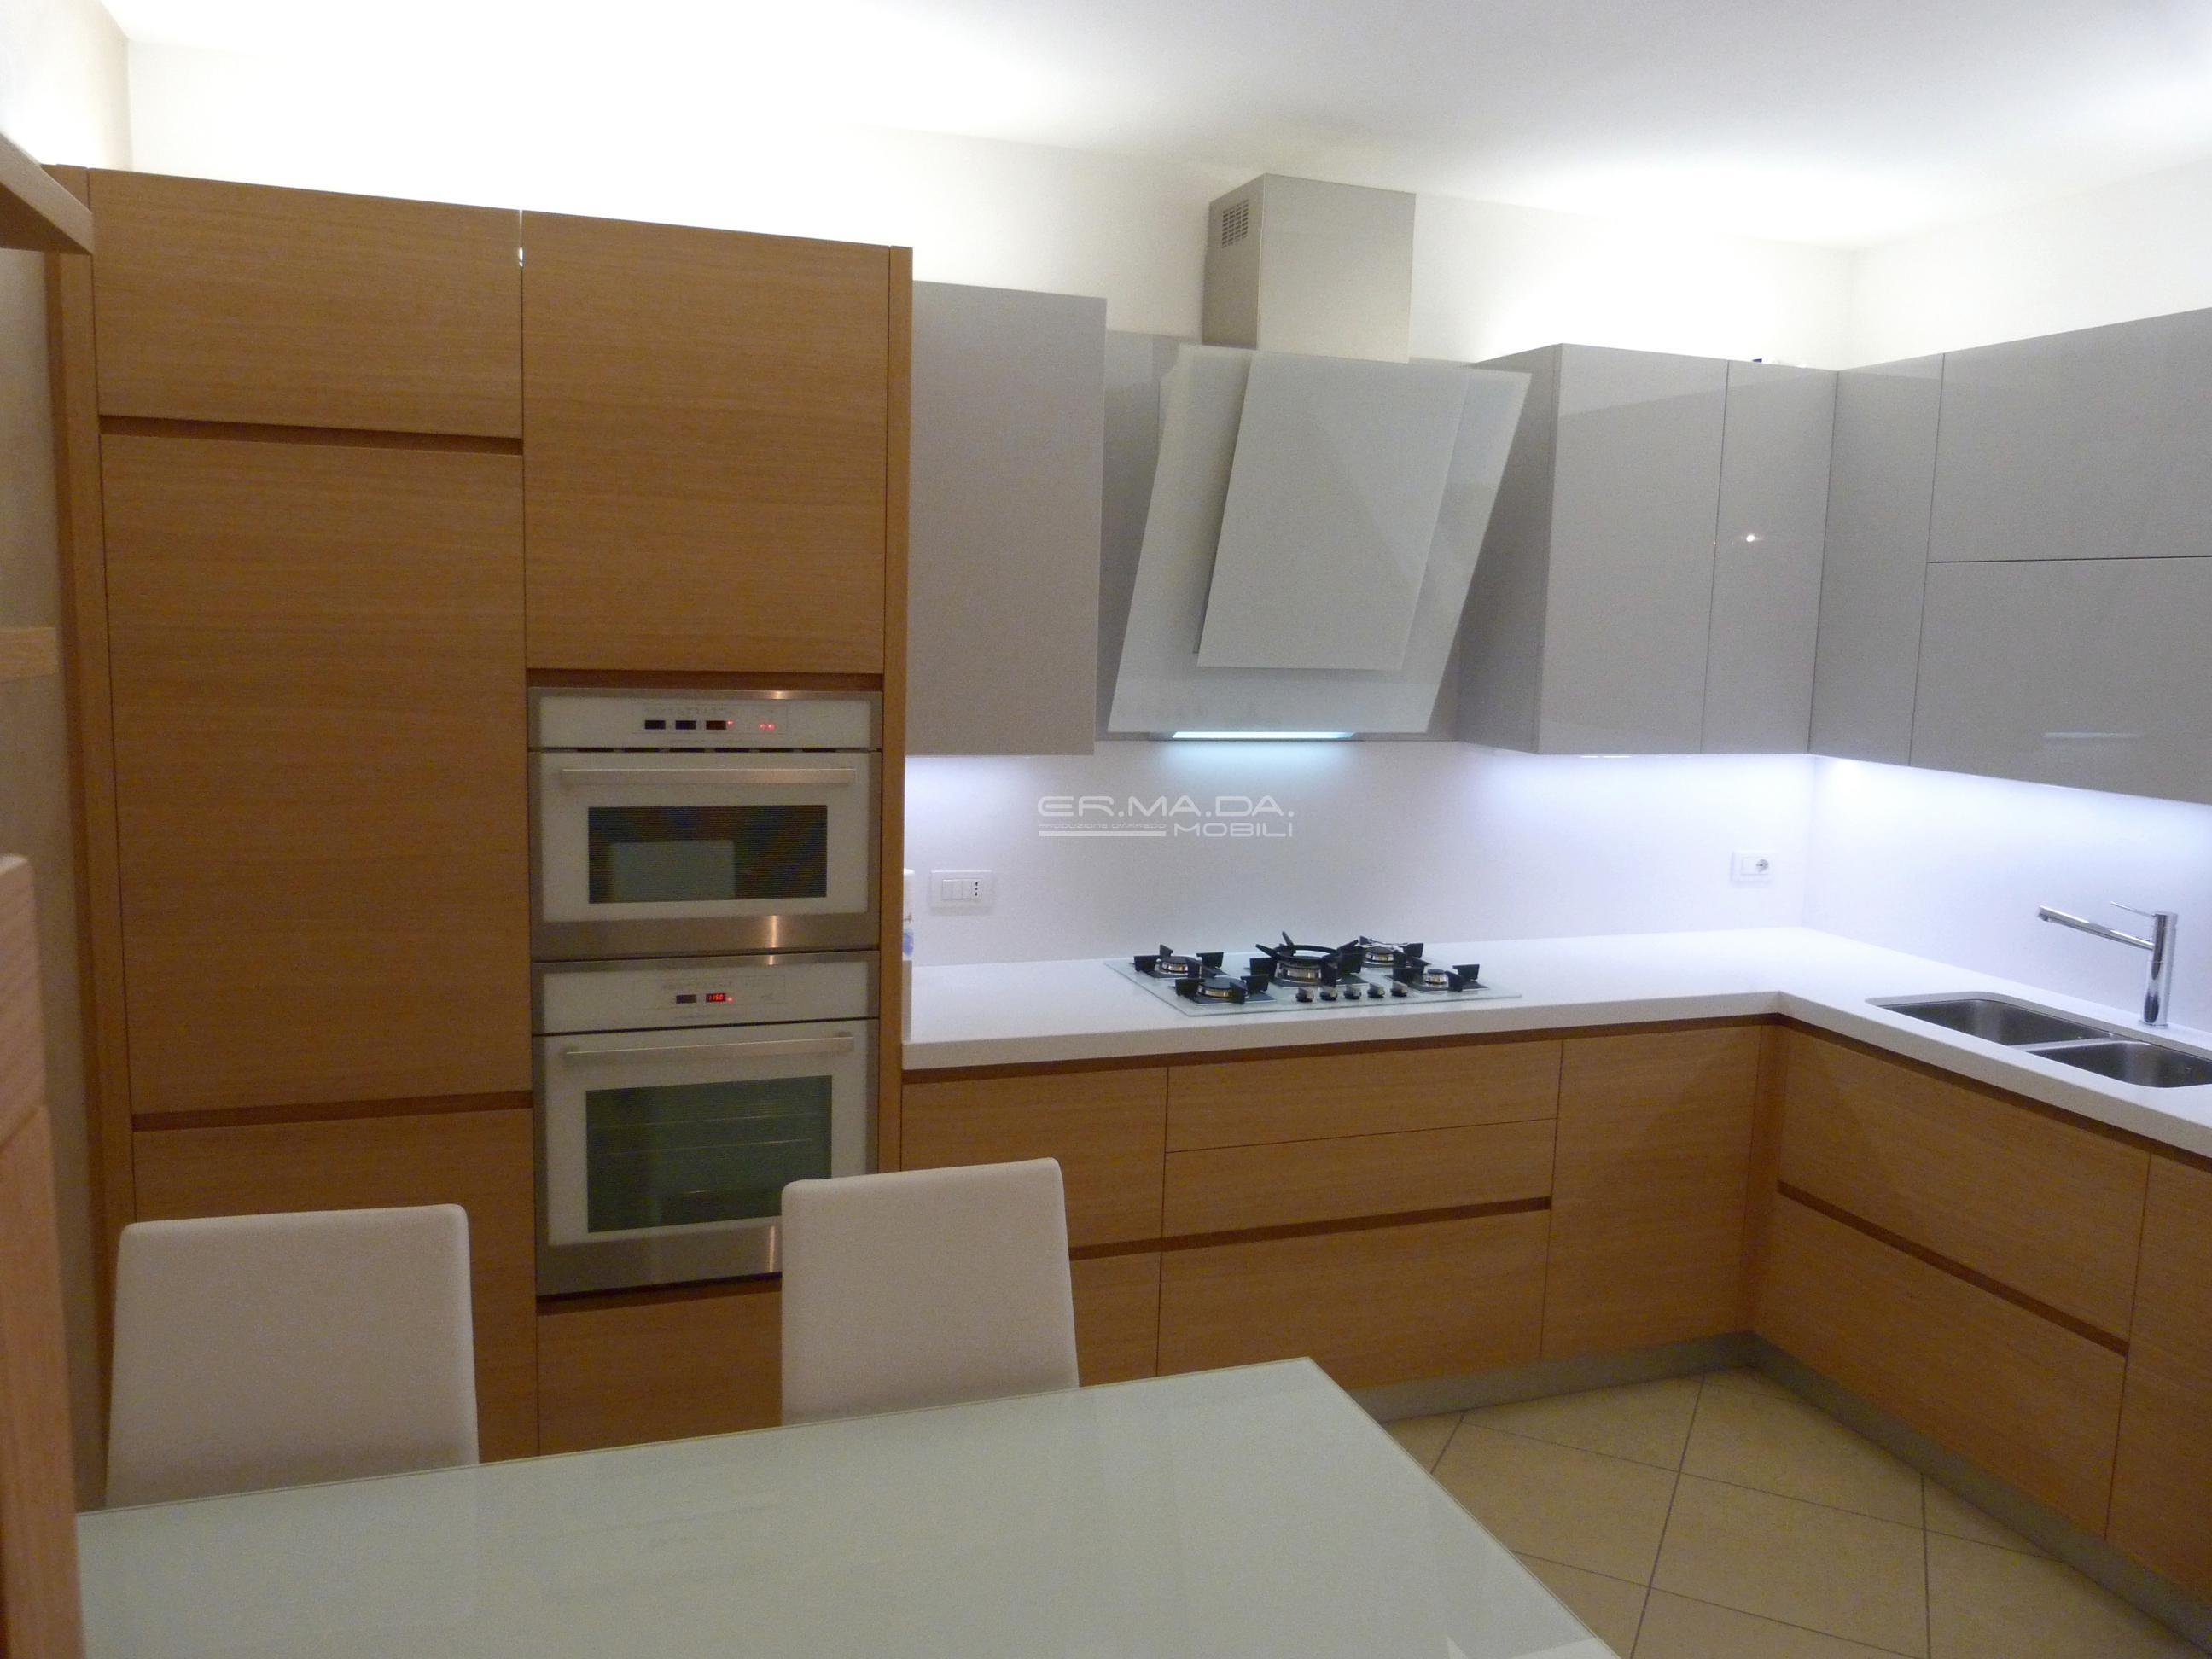 1 Cucina moderna rovere e grigio lucido - ER. MA. DA. Mobilificio ...